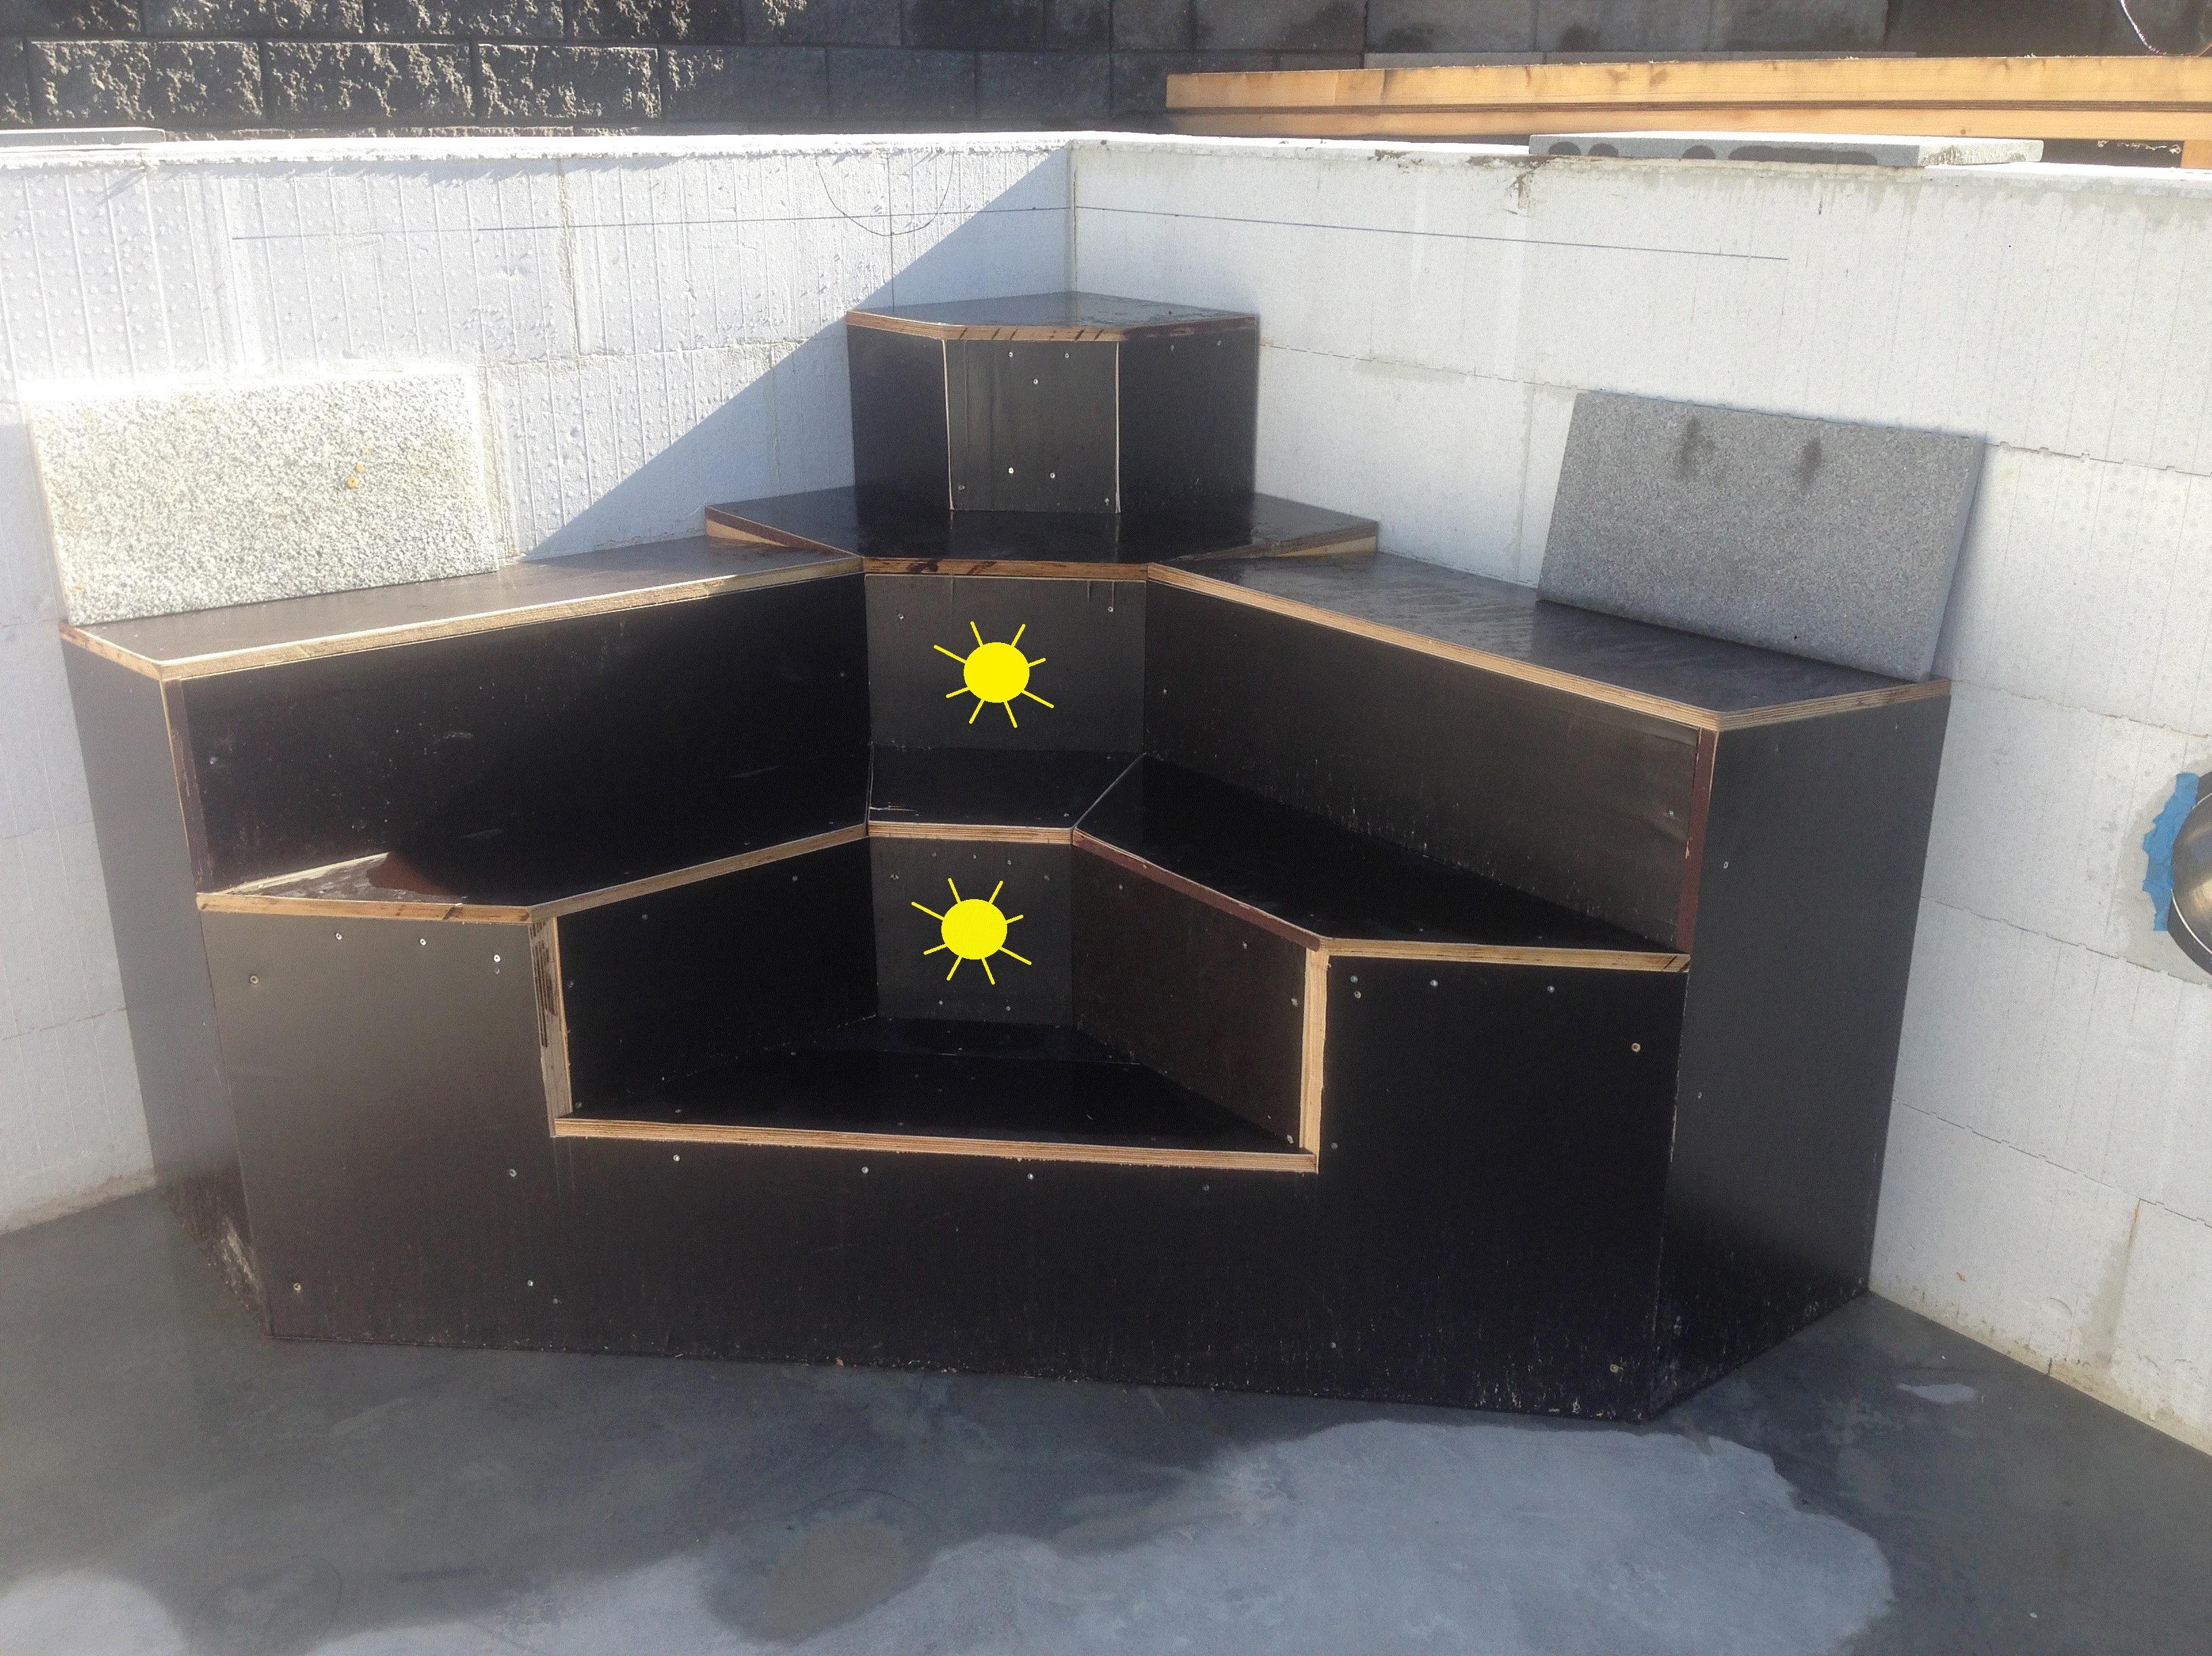 bygga pool med lecablock